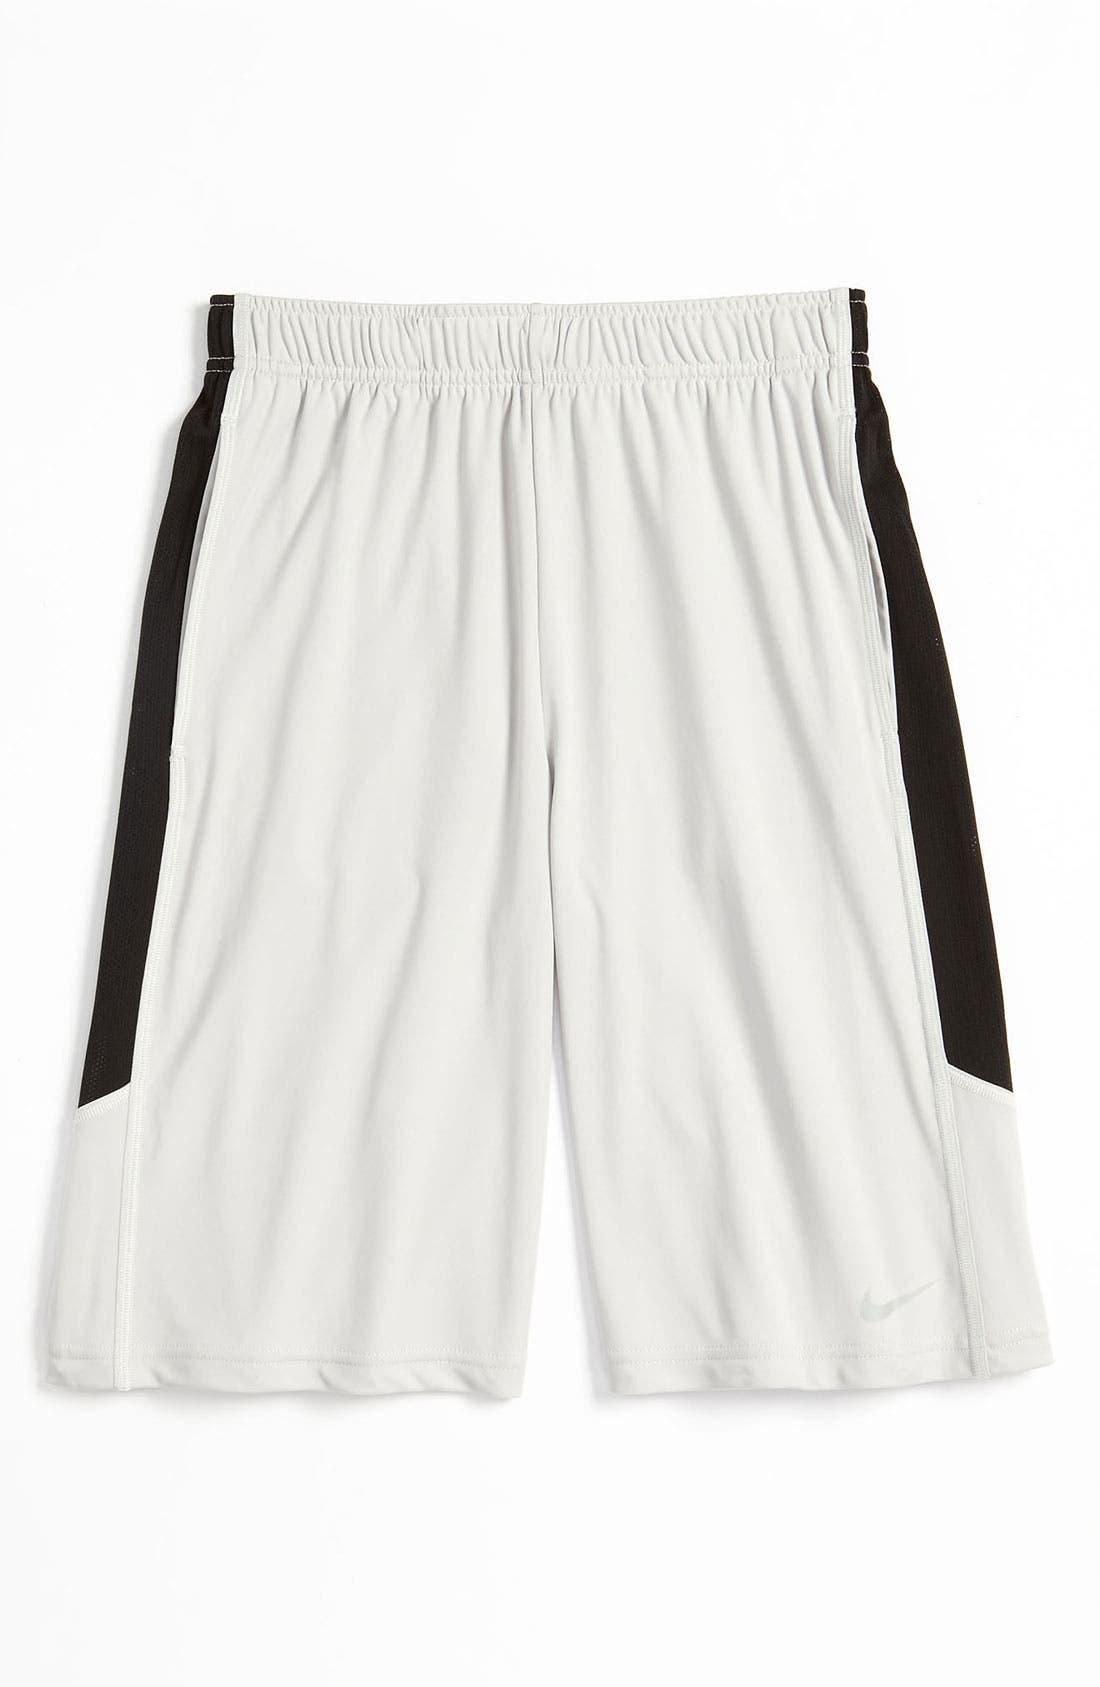 Alternate Image 1 Selected - Nike 'Lights Out' Shorts (Big Boys)